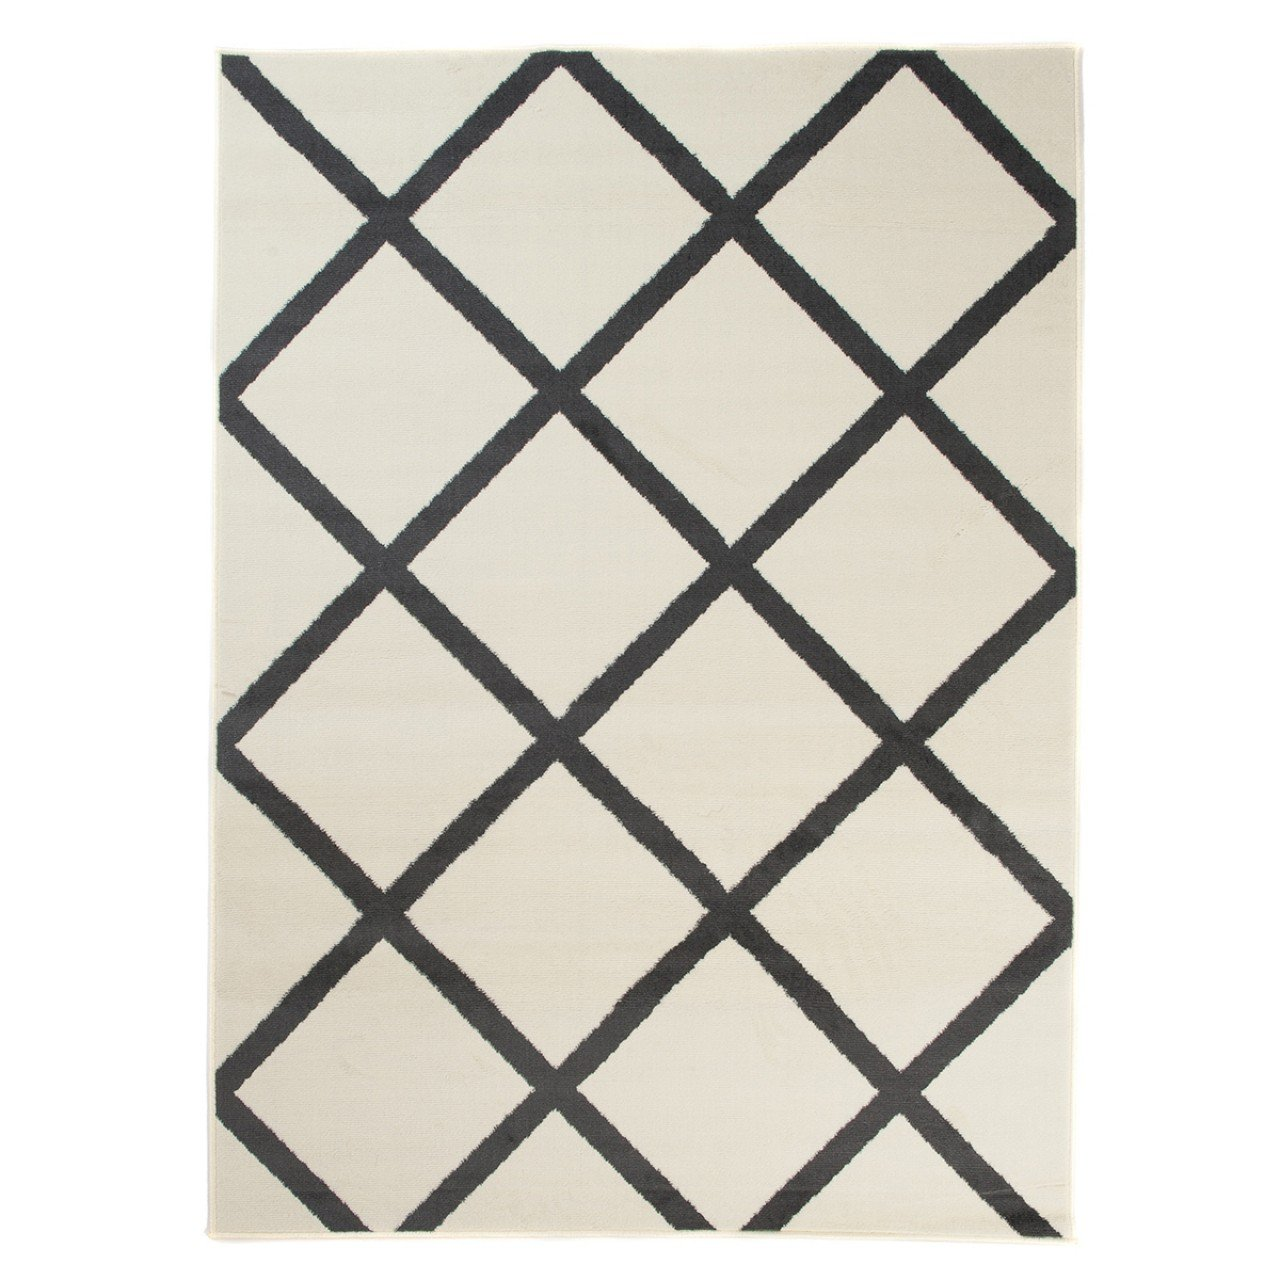 Carpeto Teppich Modern Weiß 200 x 300 cm Geometrische Muster Kurzflor Malmo Kollektion